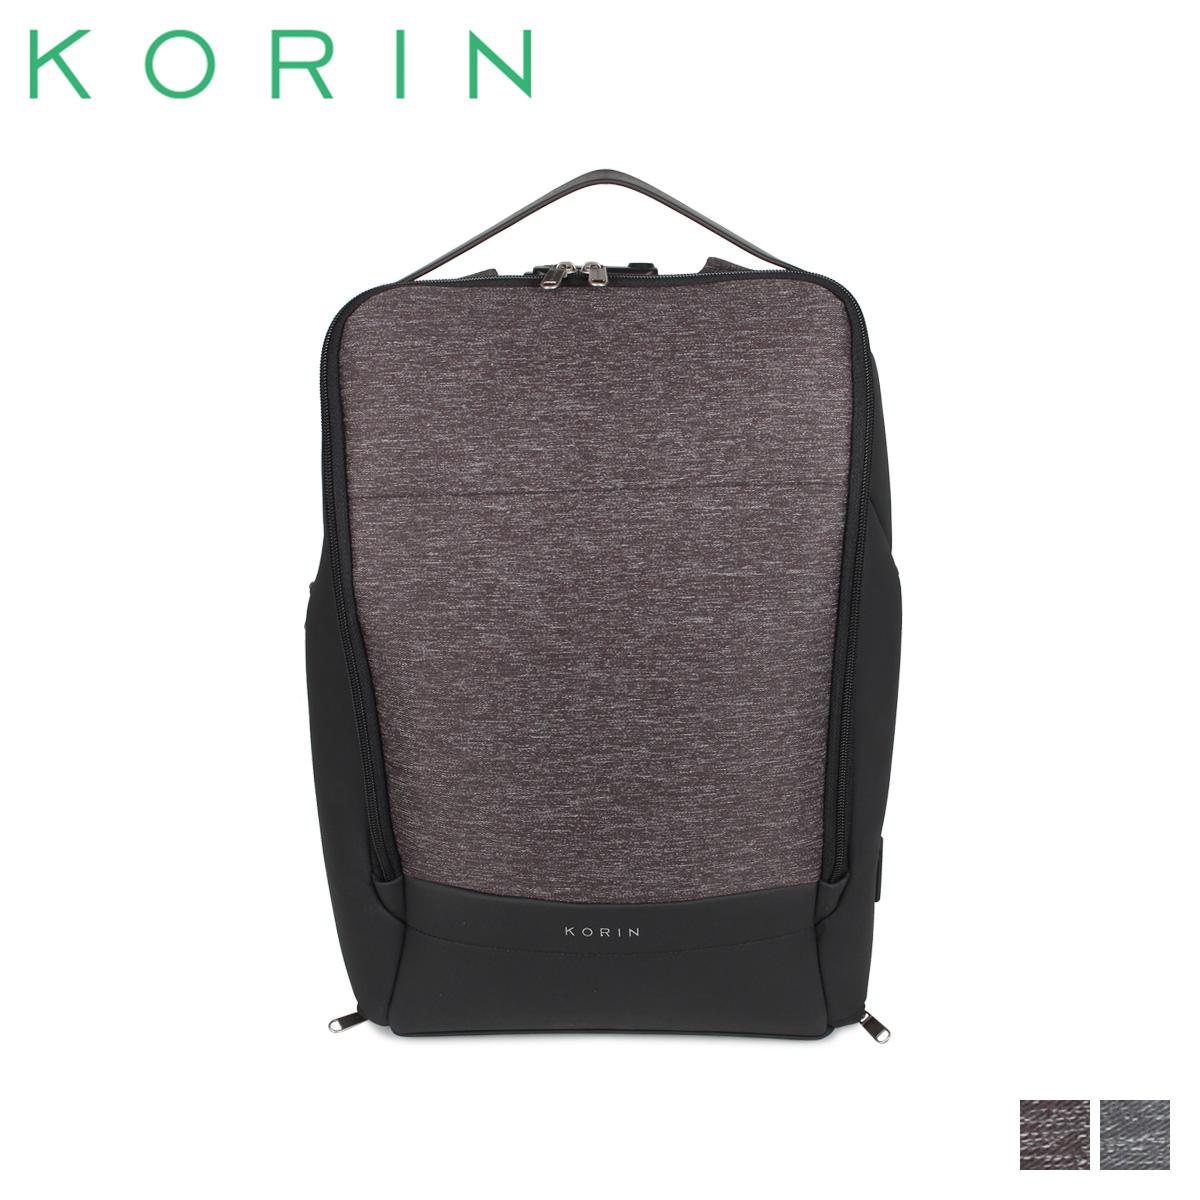 KORIN DESIGN コリンデザイン フレックスパック リュック バッグ バックパック メンズ レディース 18L 防犯 FLEXPACK PRO ブラック グレー 黒